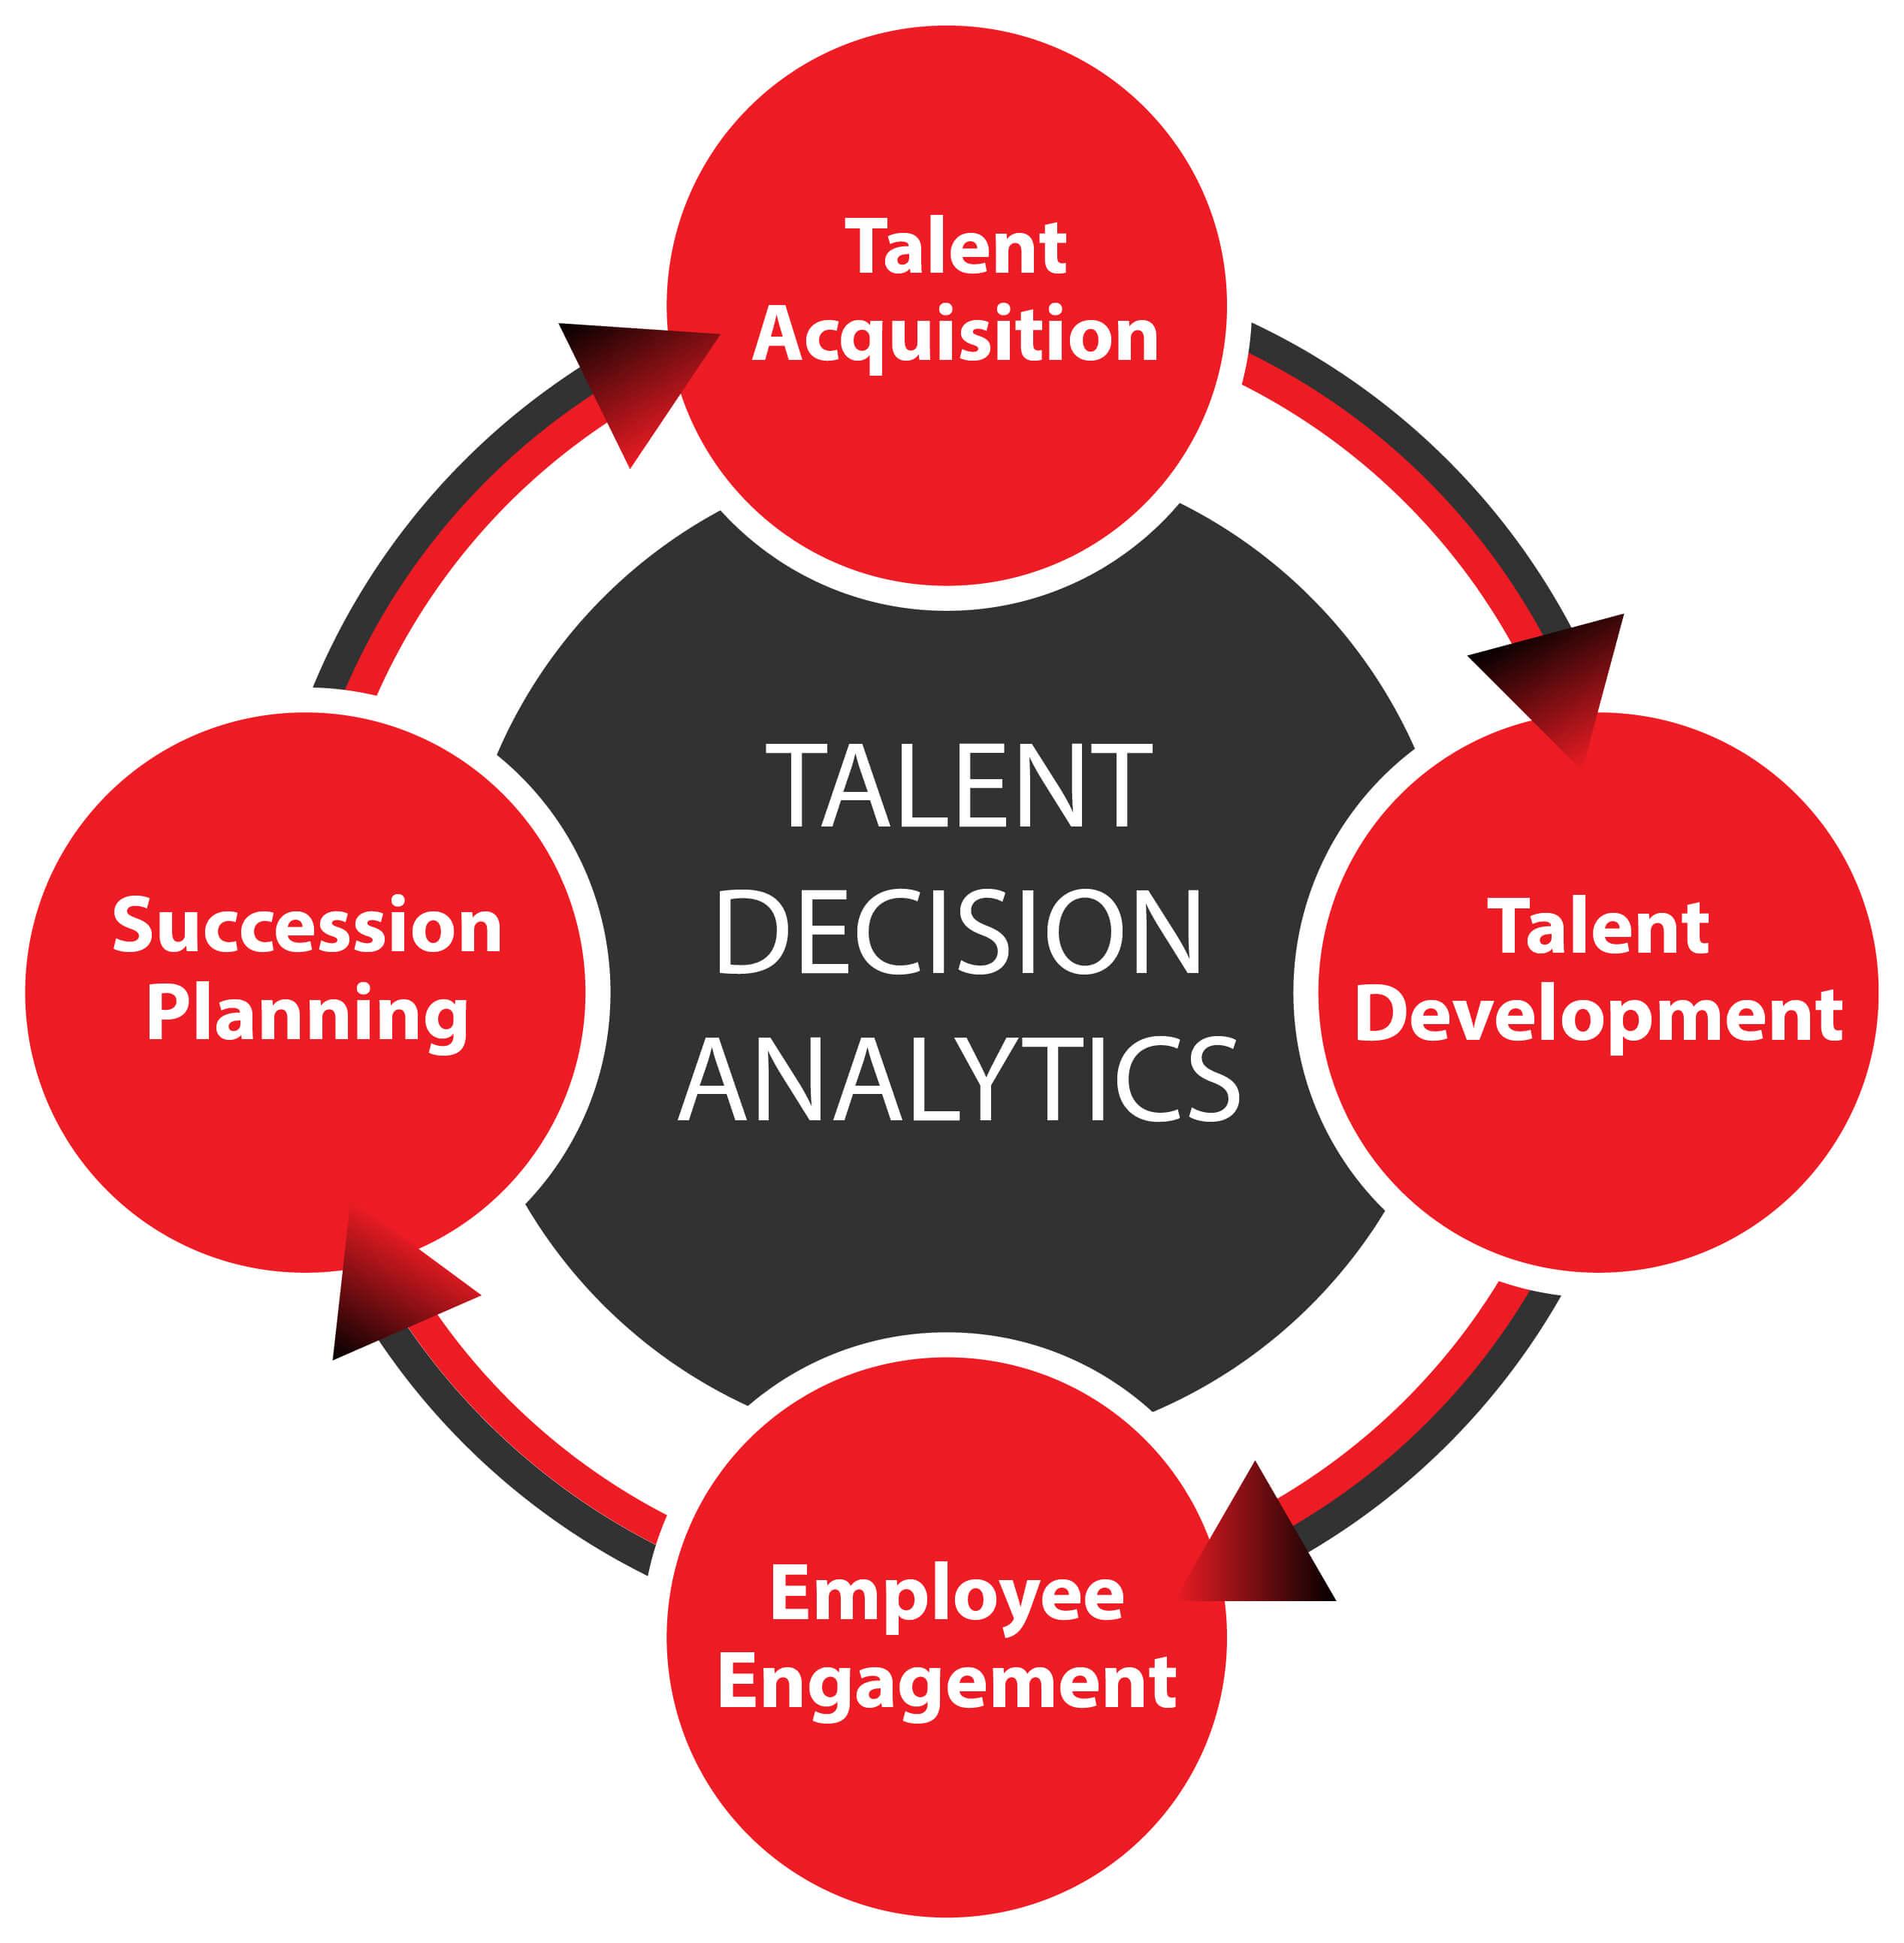 Talent Decision Analytics